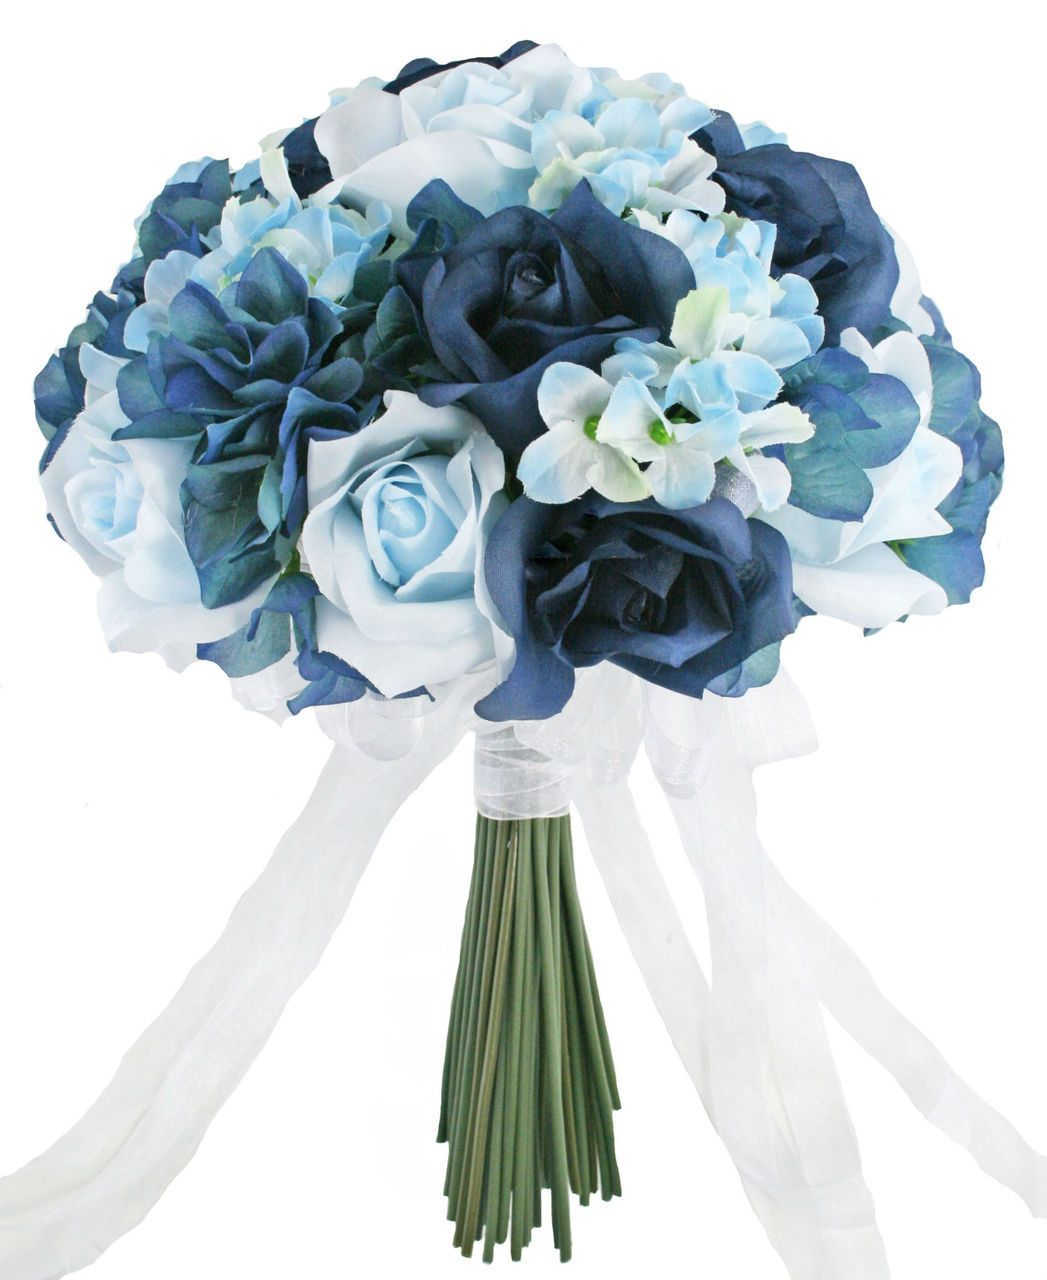 Light Blue Flowers For Weddings: Hydrangea Rose Navy Light Blue Artificial Wedding Bouquets